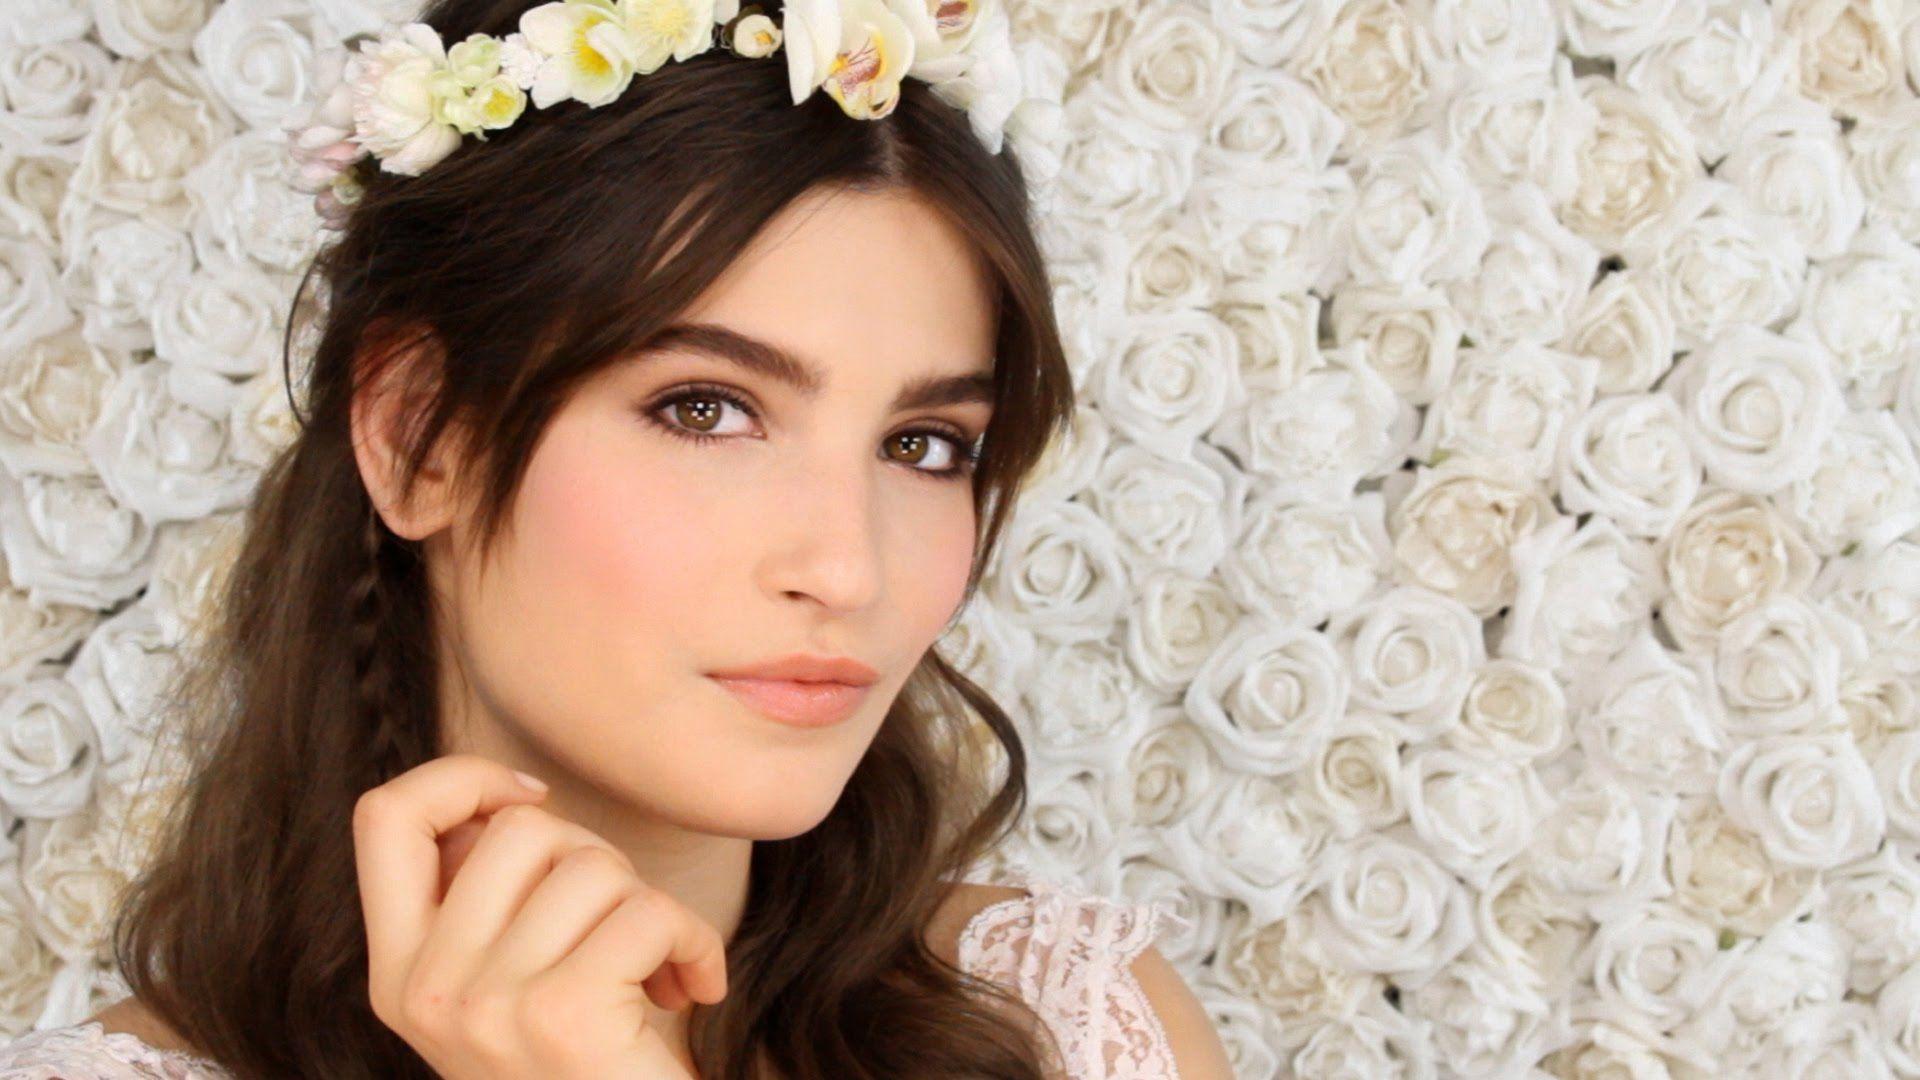 How To Chic Bohemian Bridal Makeup Tutorial By Lisa Eldridge With Lancôme